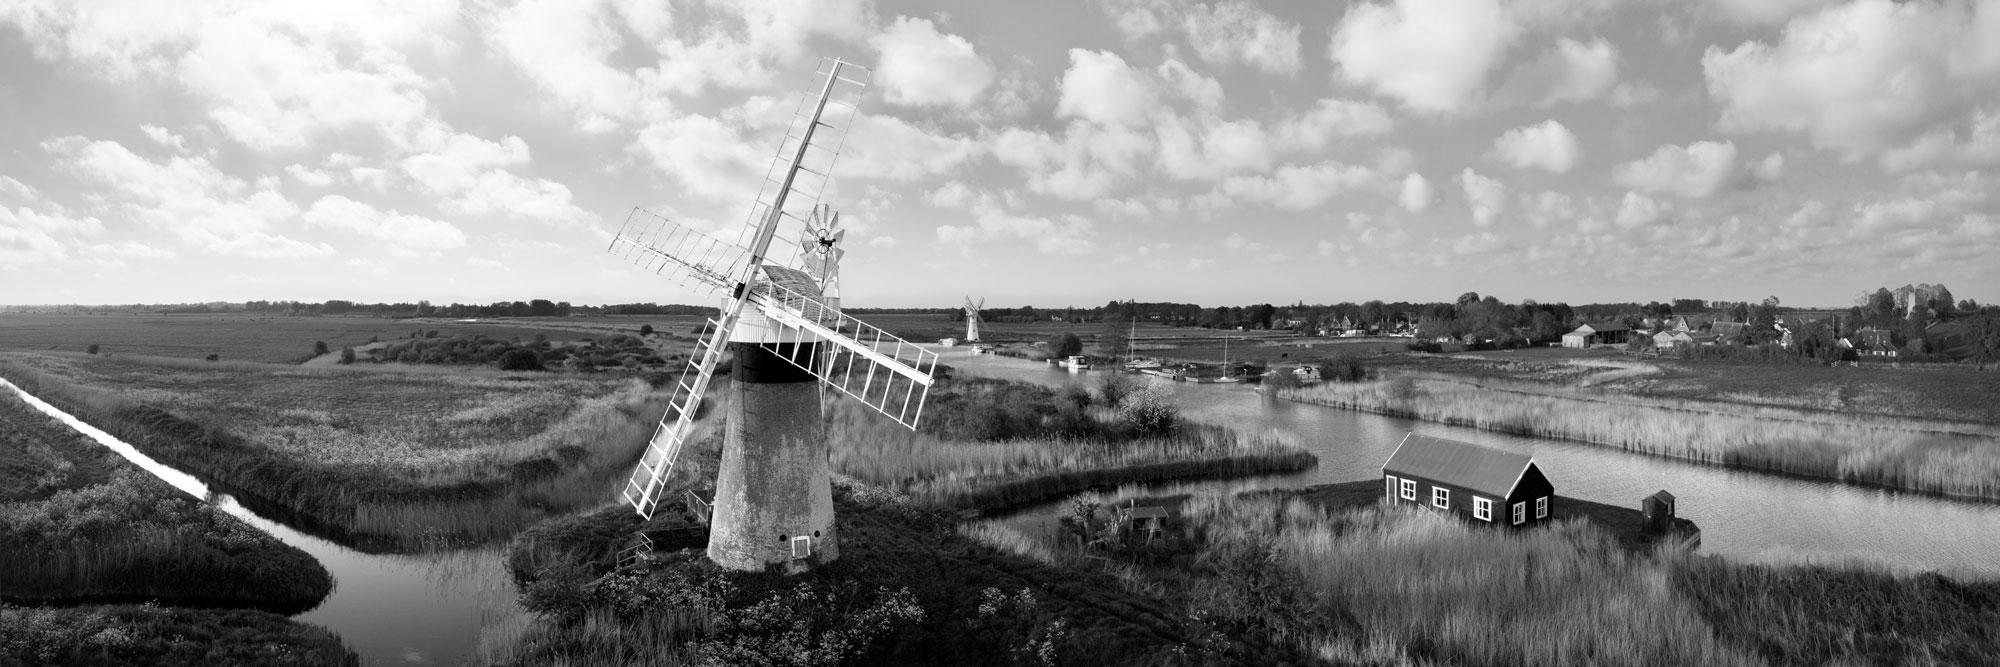 English windmill aerial print